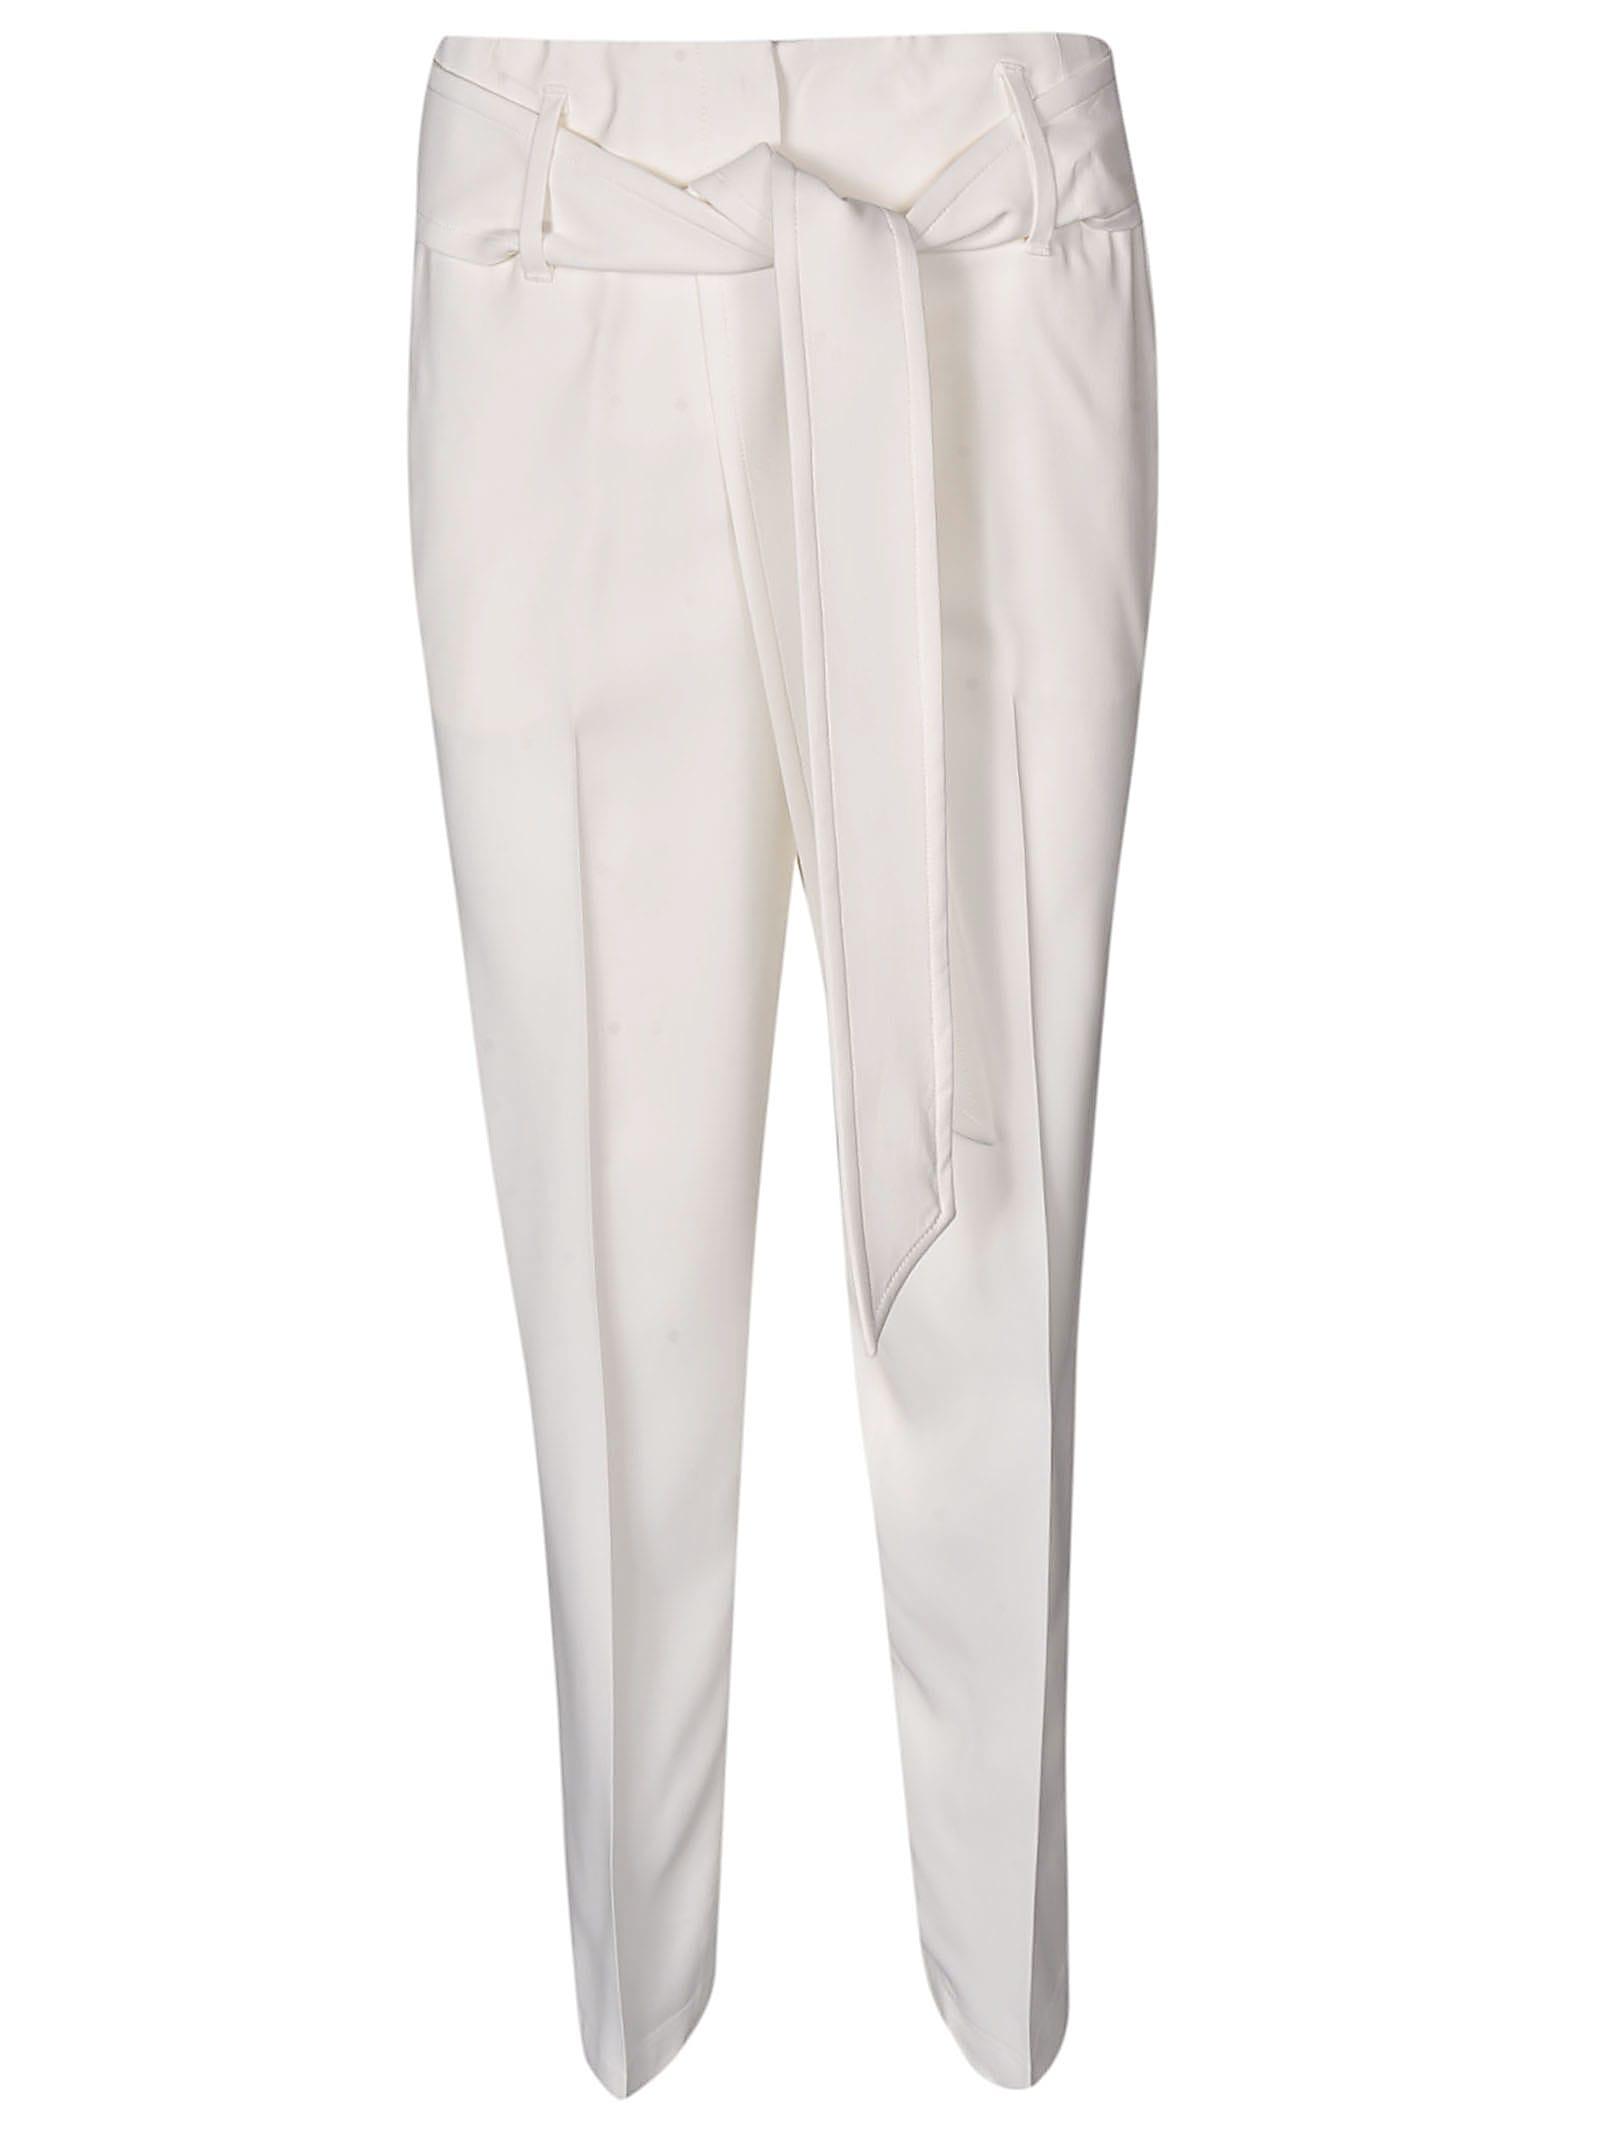 Ermanno Scervino Tie Waist Trousers